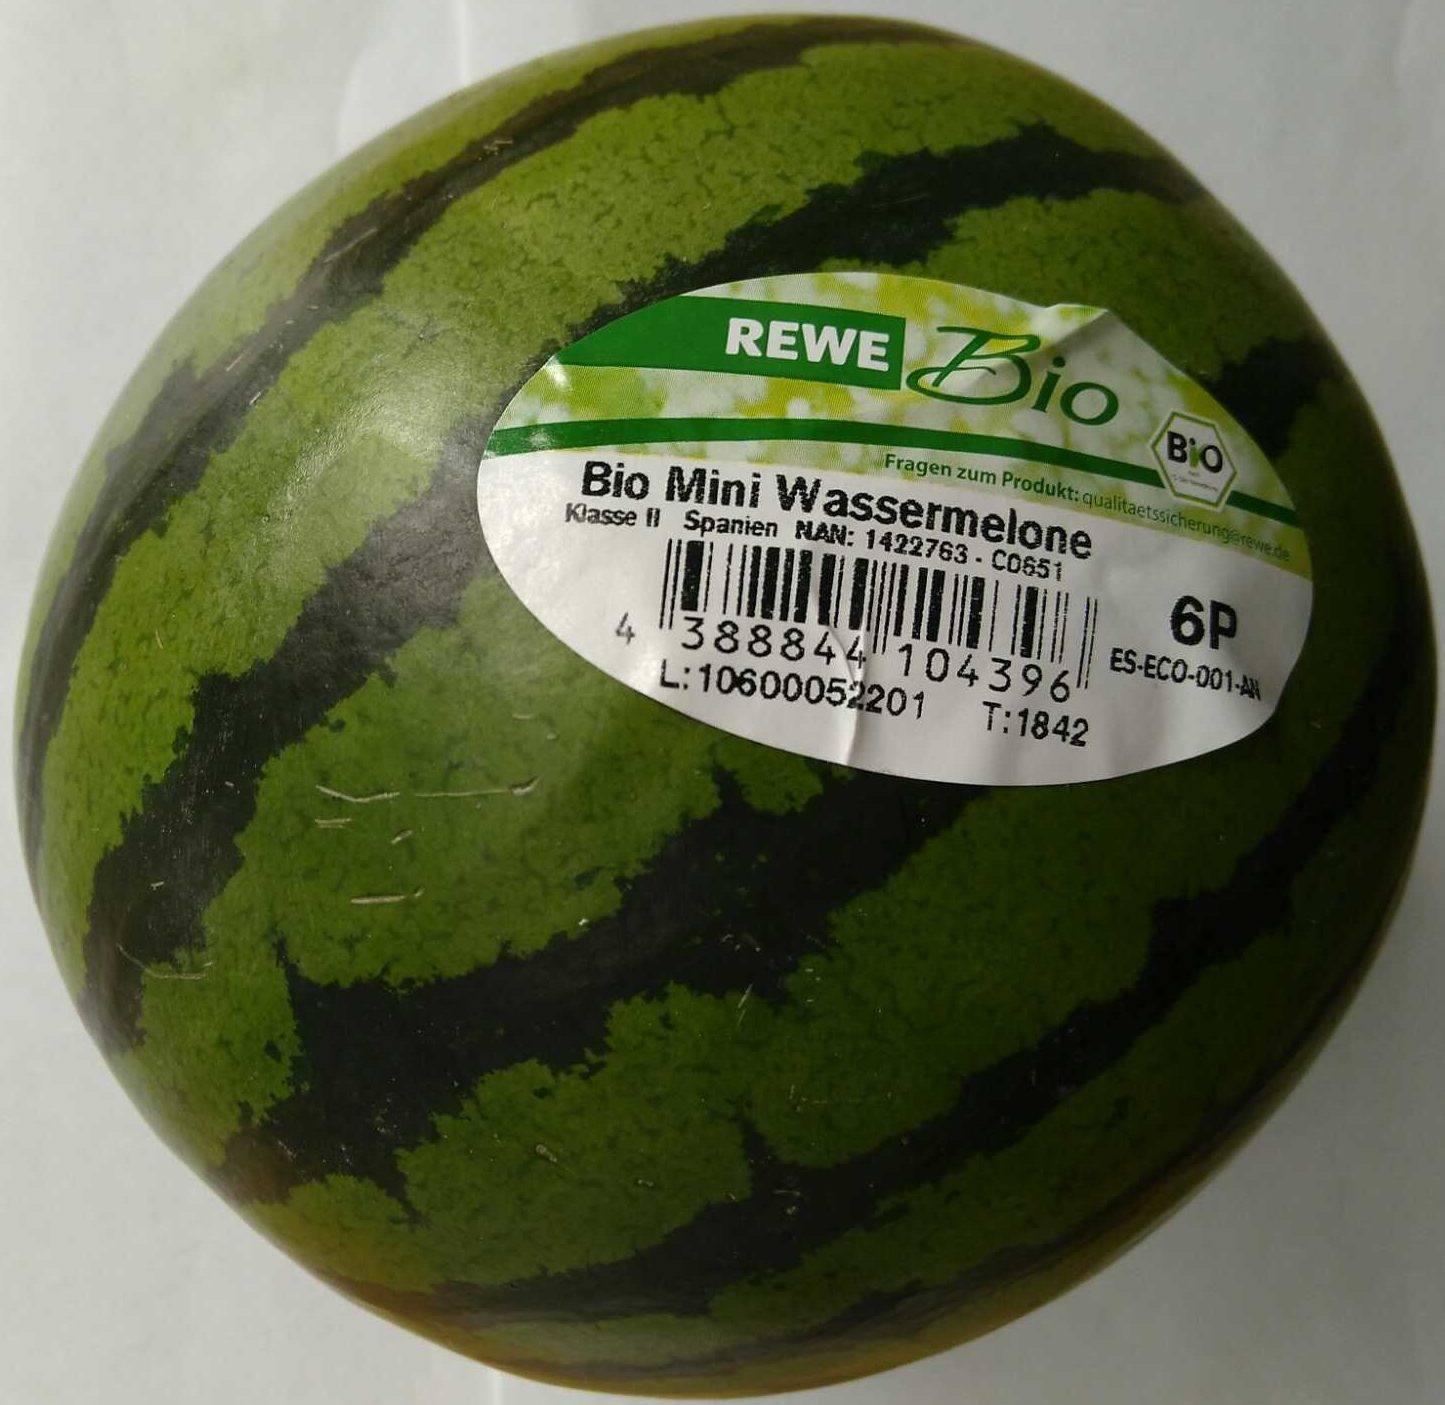 Bio Mini Wassermelone - Produit